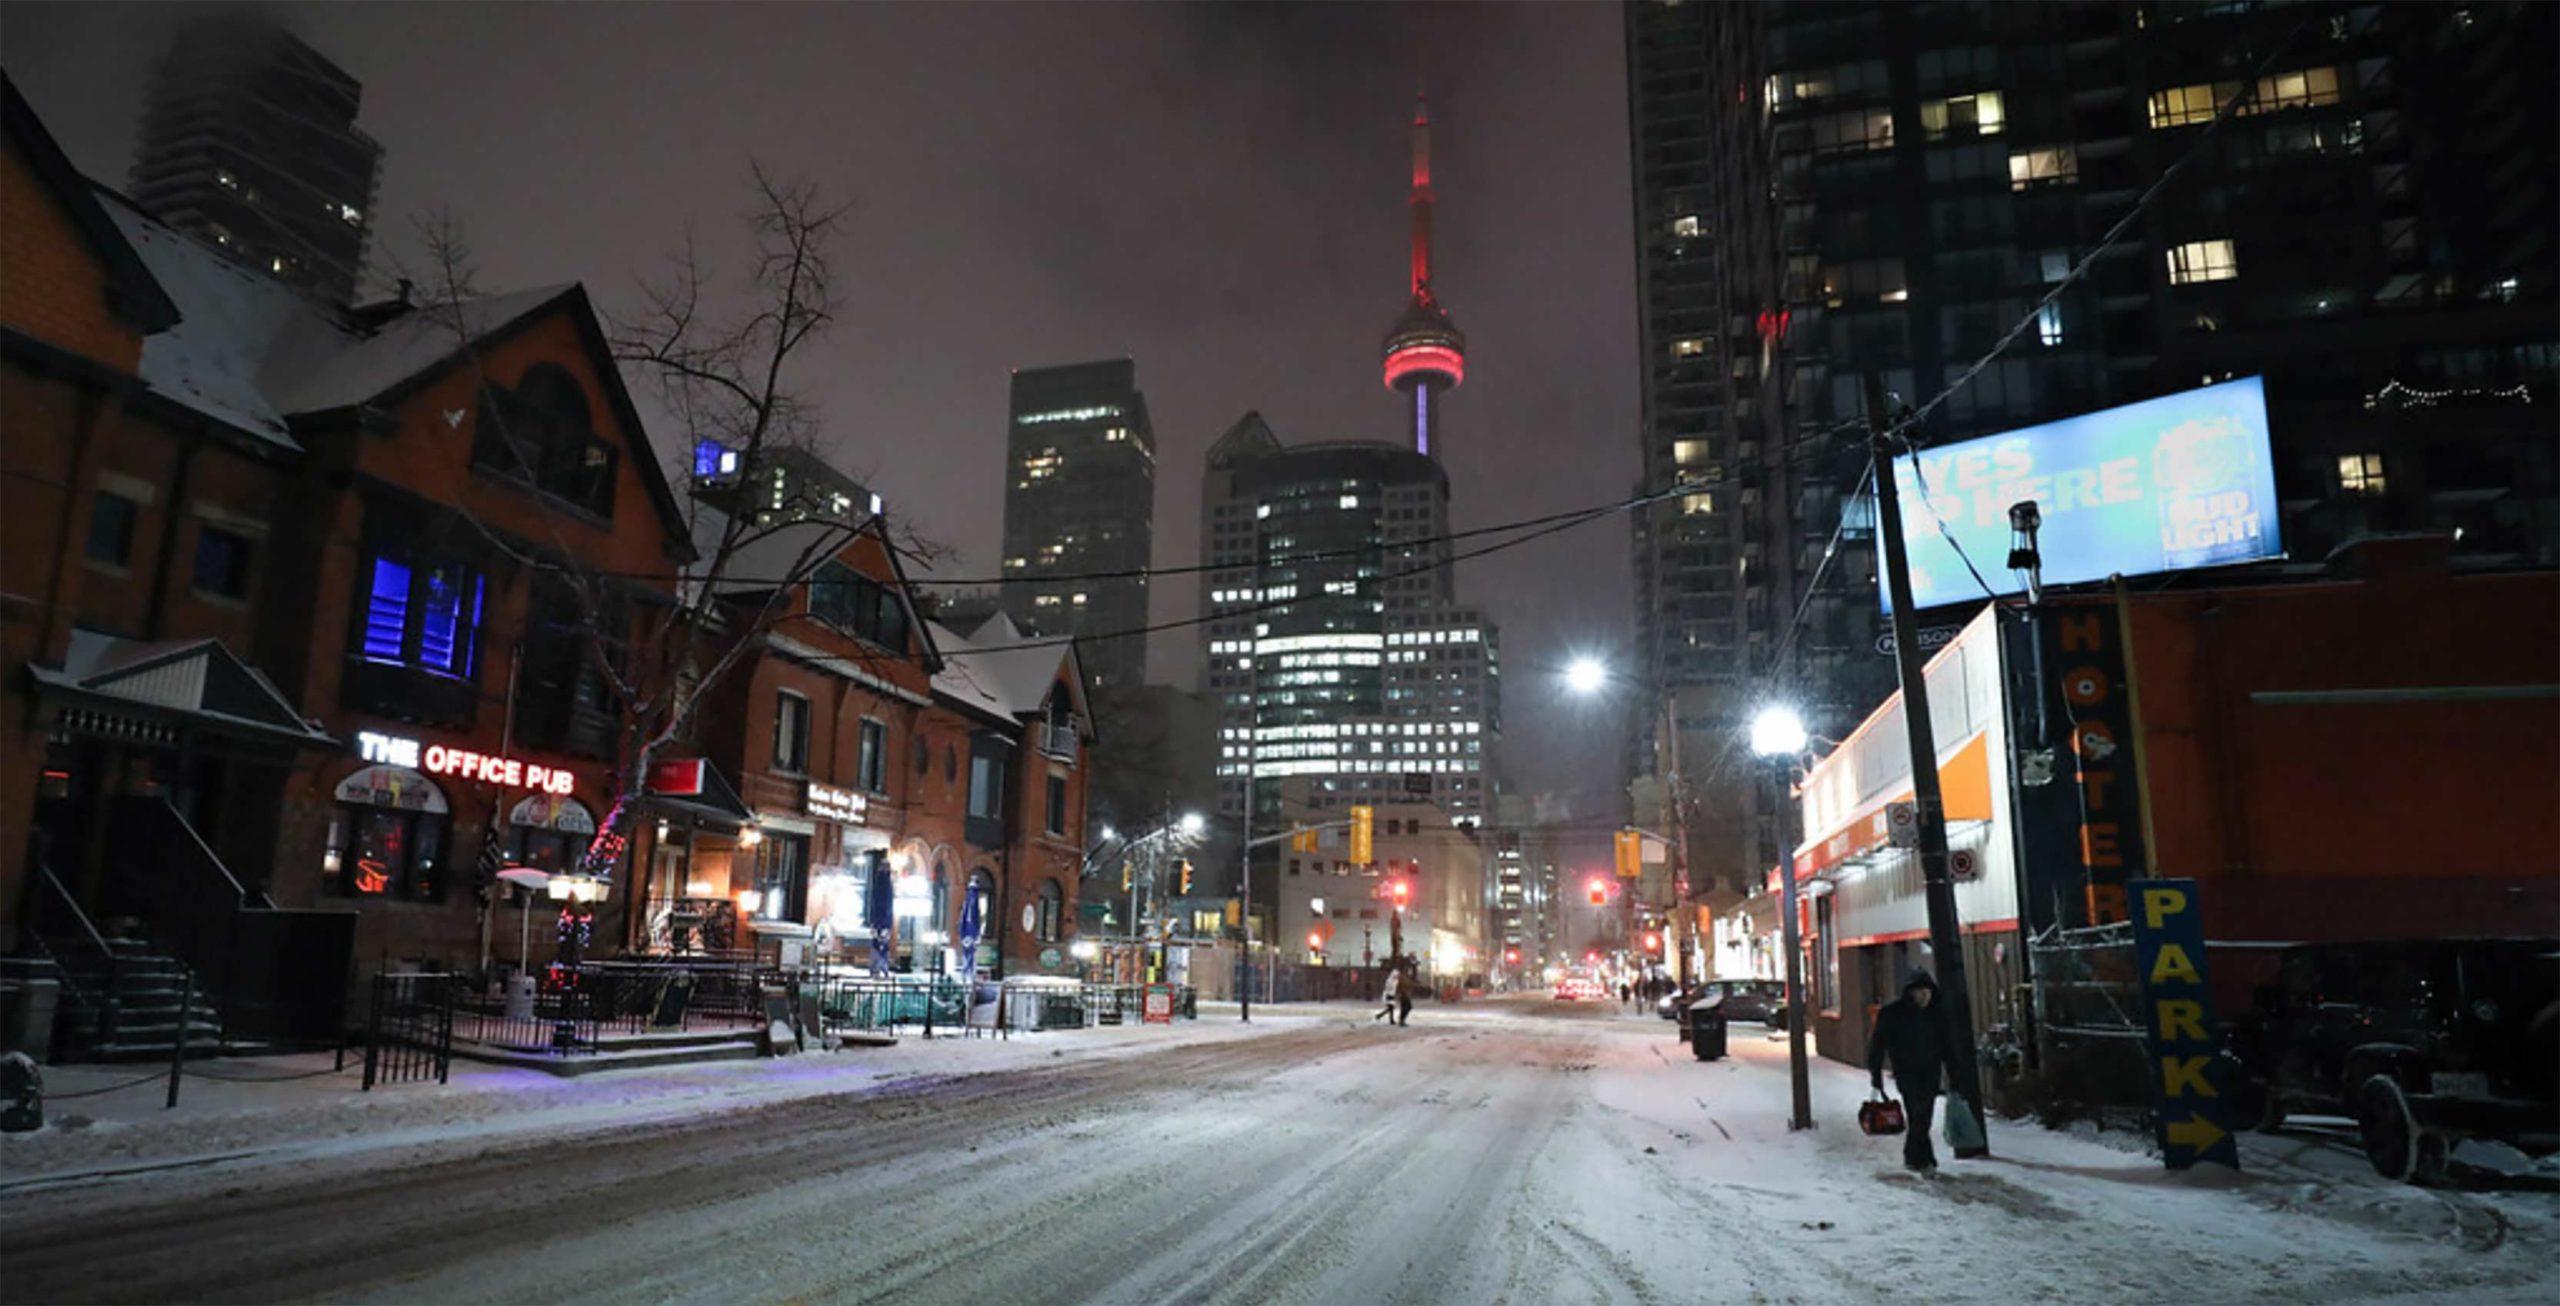 Toronto in the winter